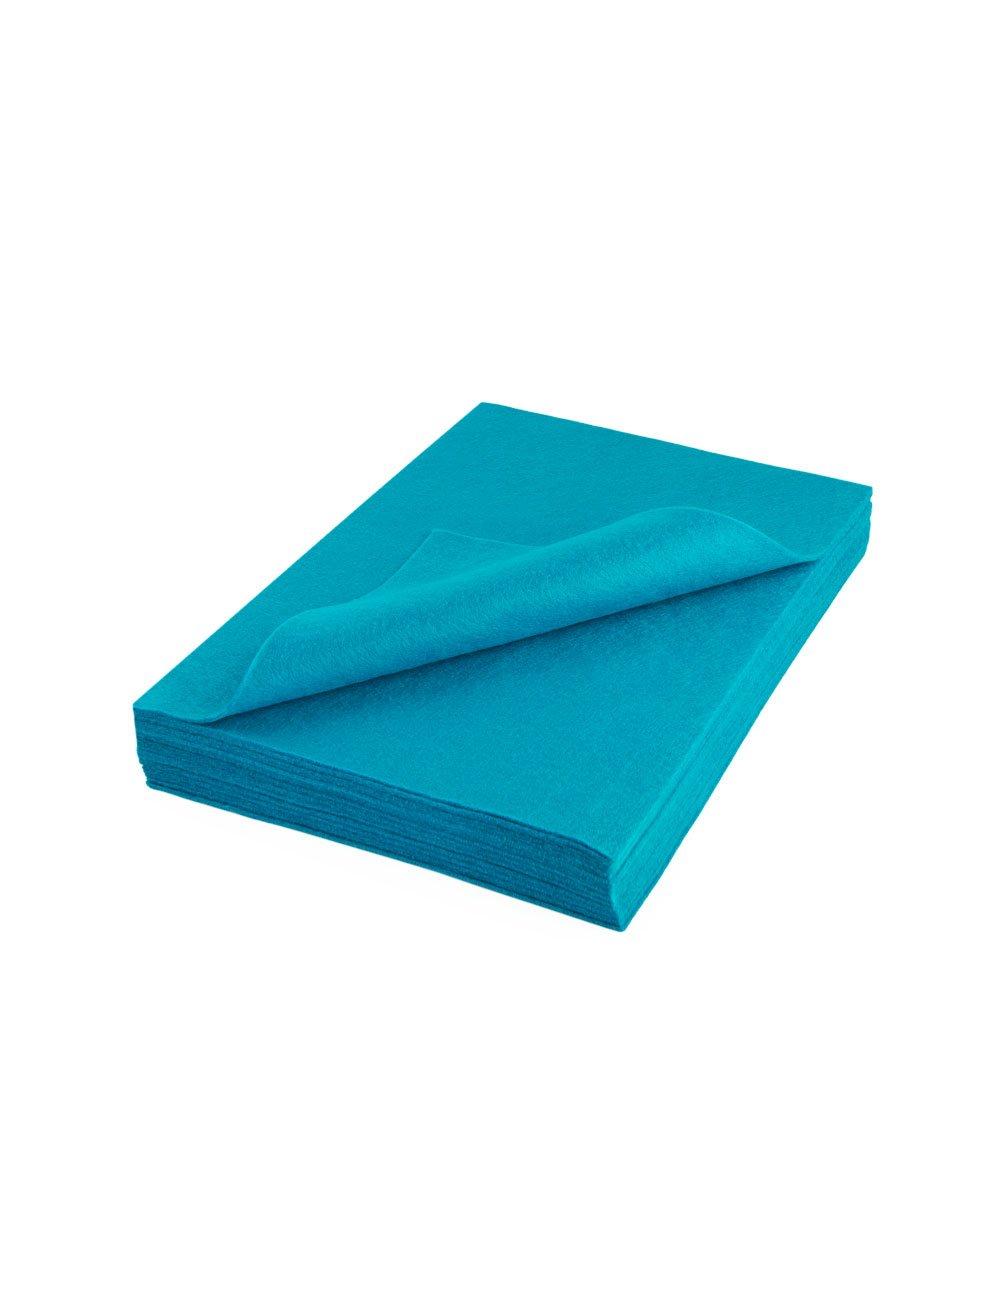 "Acrylic Felt Sheet 9"" X 12"": 25 PCS, Turquoise The Felt Store"